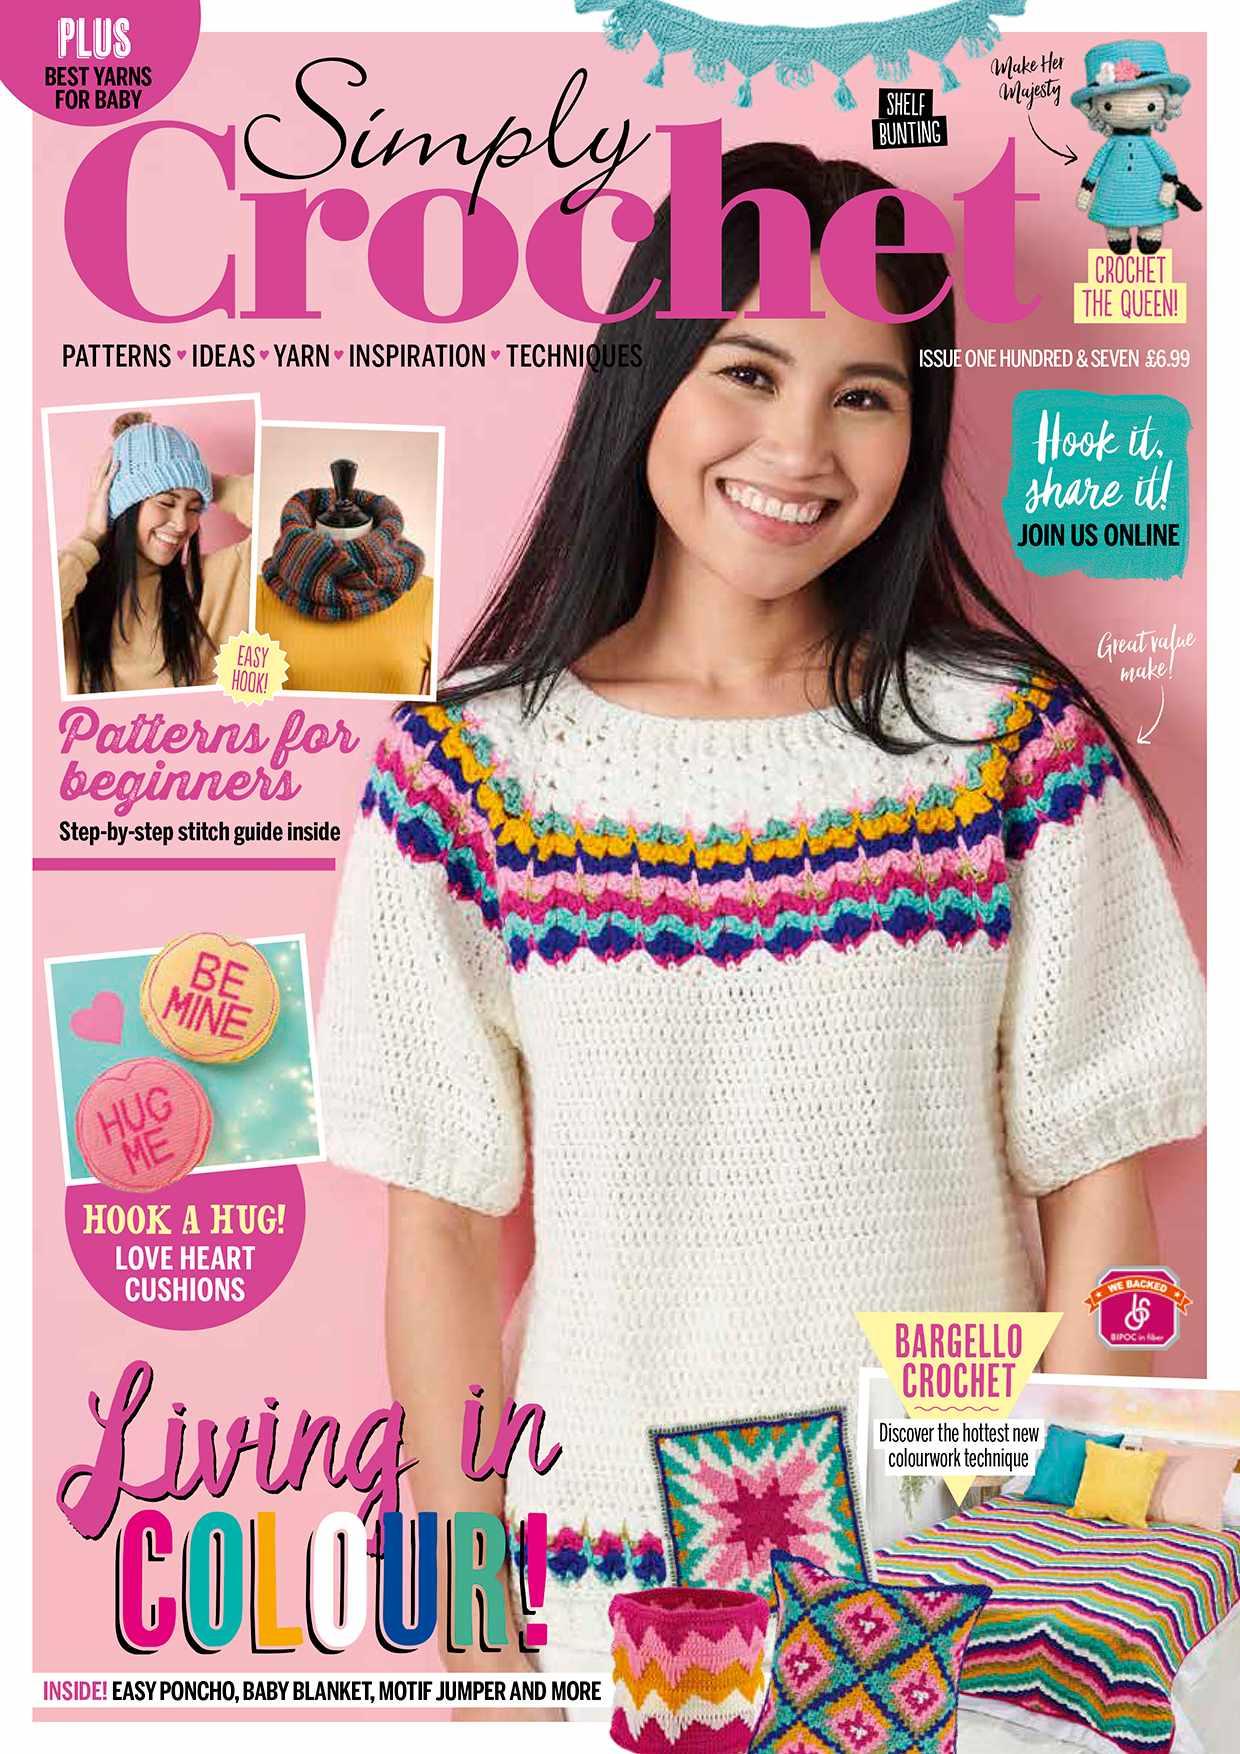 Simply_crochet_issue_107_digi_cover